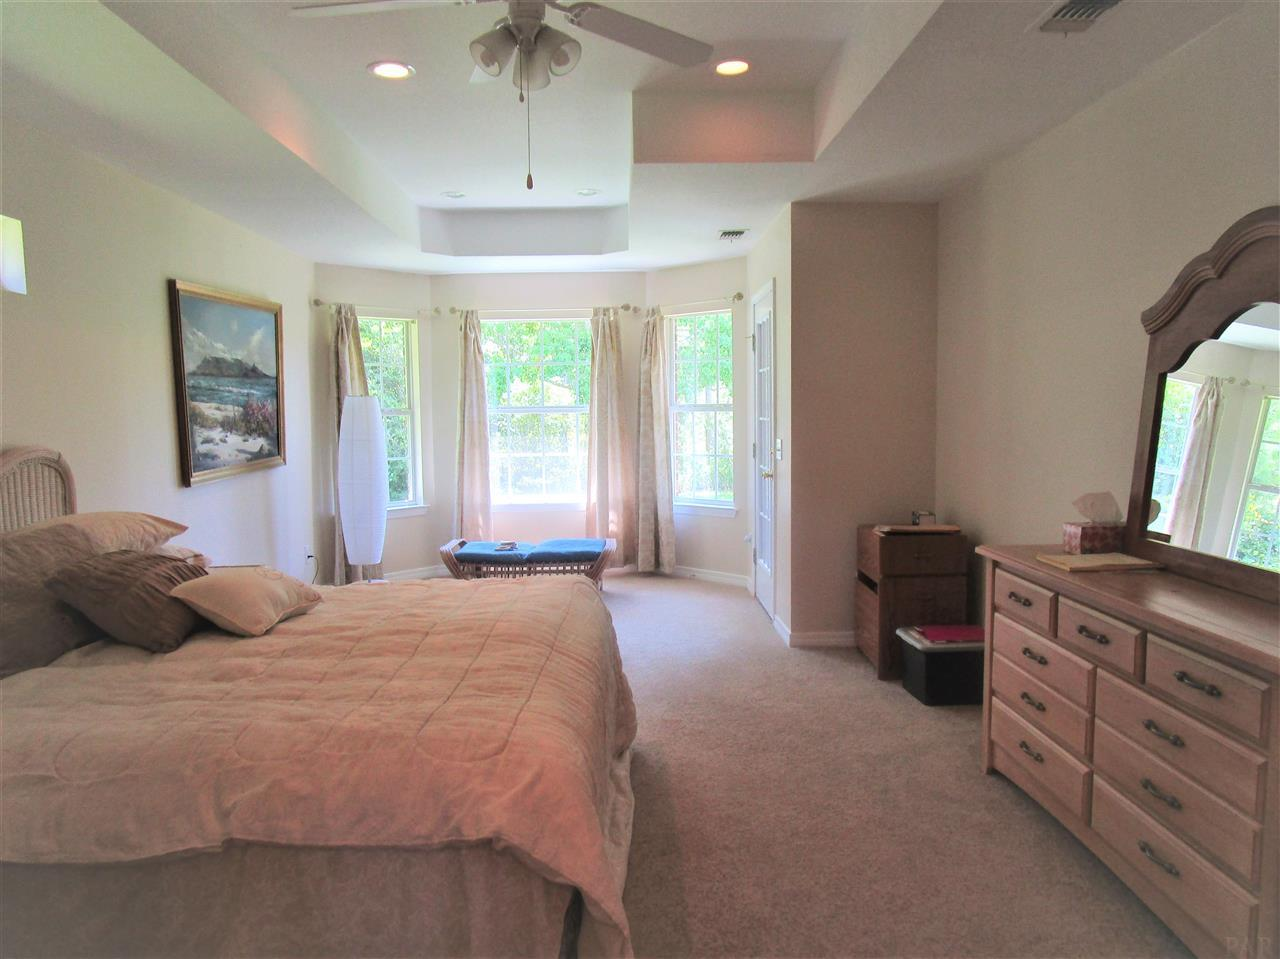 1665 Village Pkwy, Gulf Breeze, FL 32563